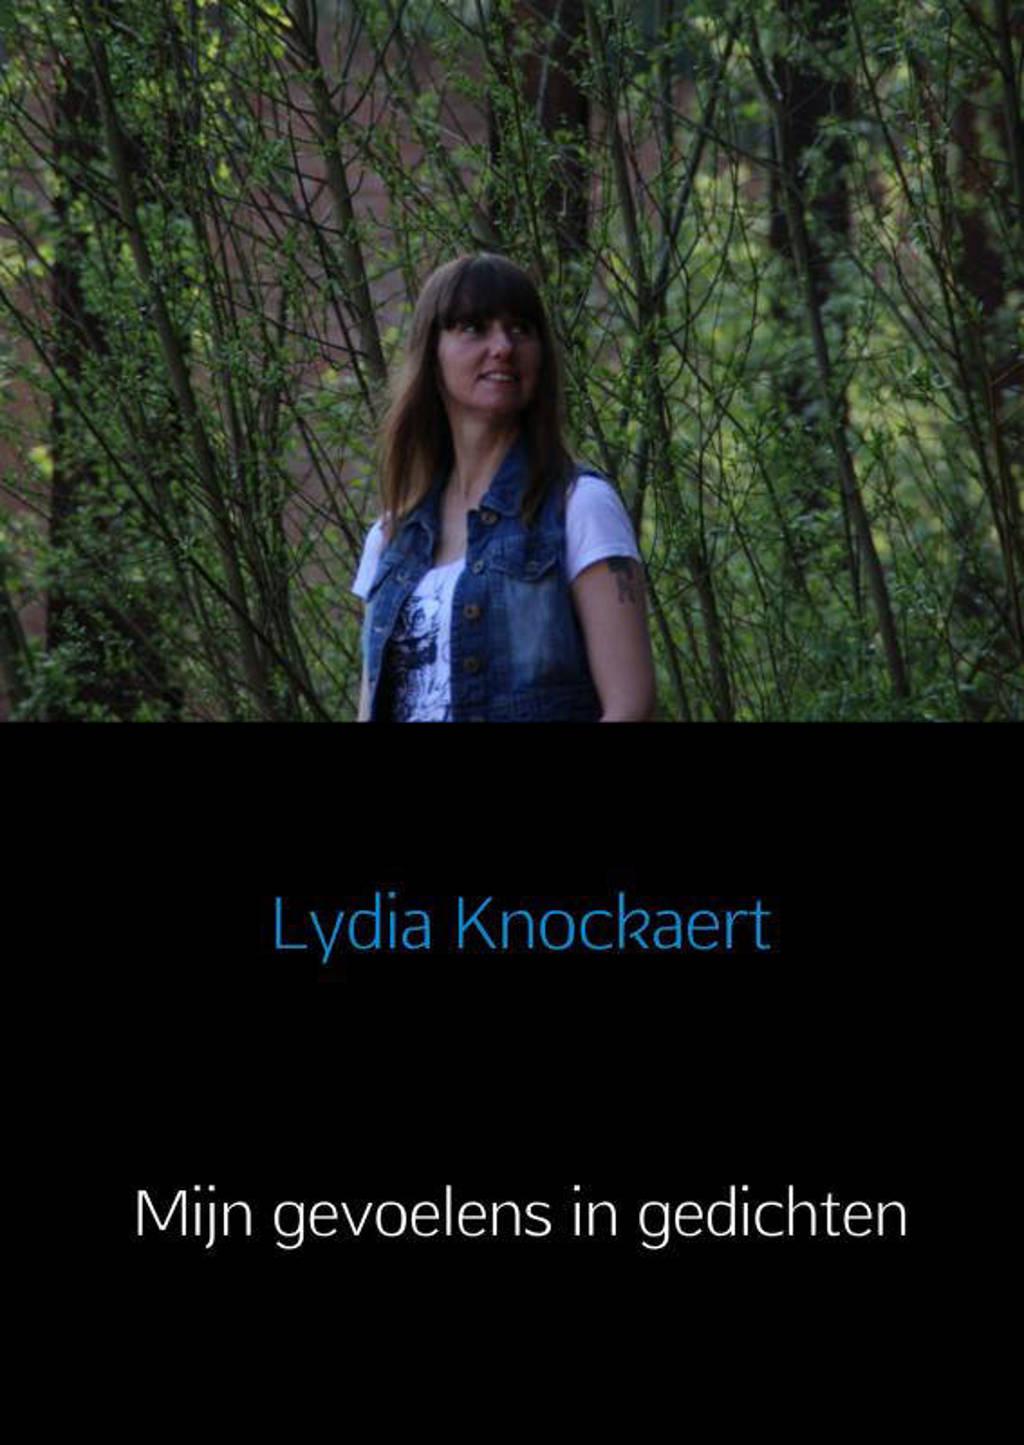 Mijn gevoelens in gedichten - Lydia Knockaert